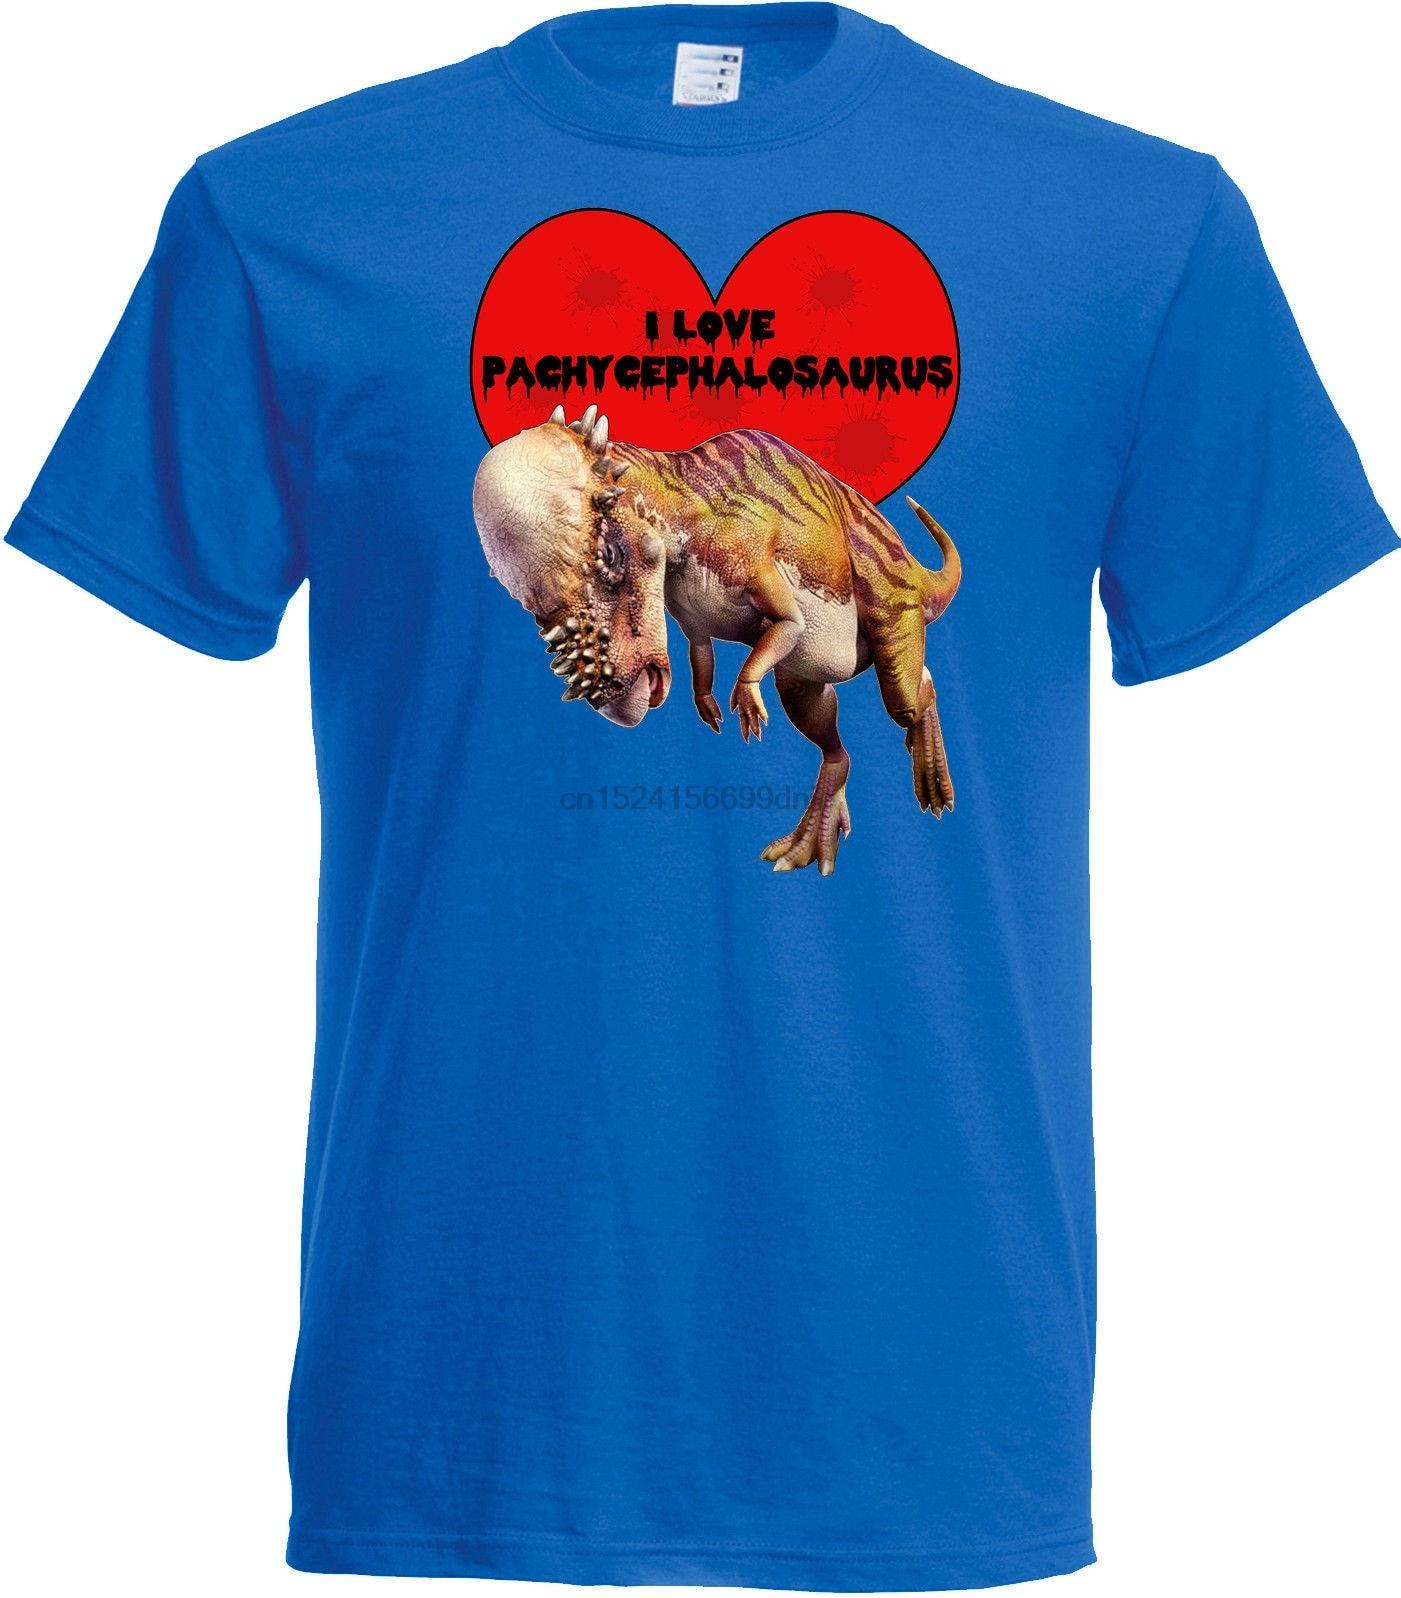 Camiseta I Love Pachycephalosaurus Elección de tamaño y colección de dinosaurios cols